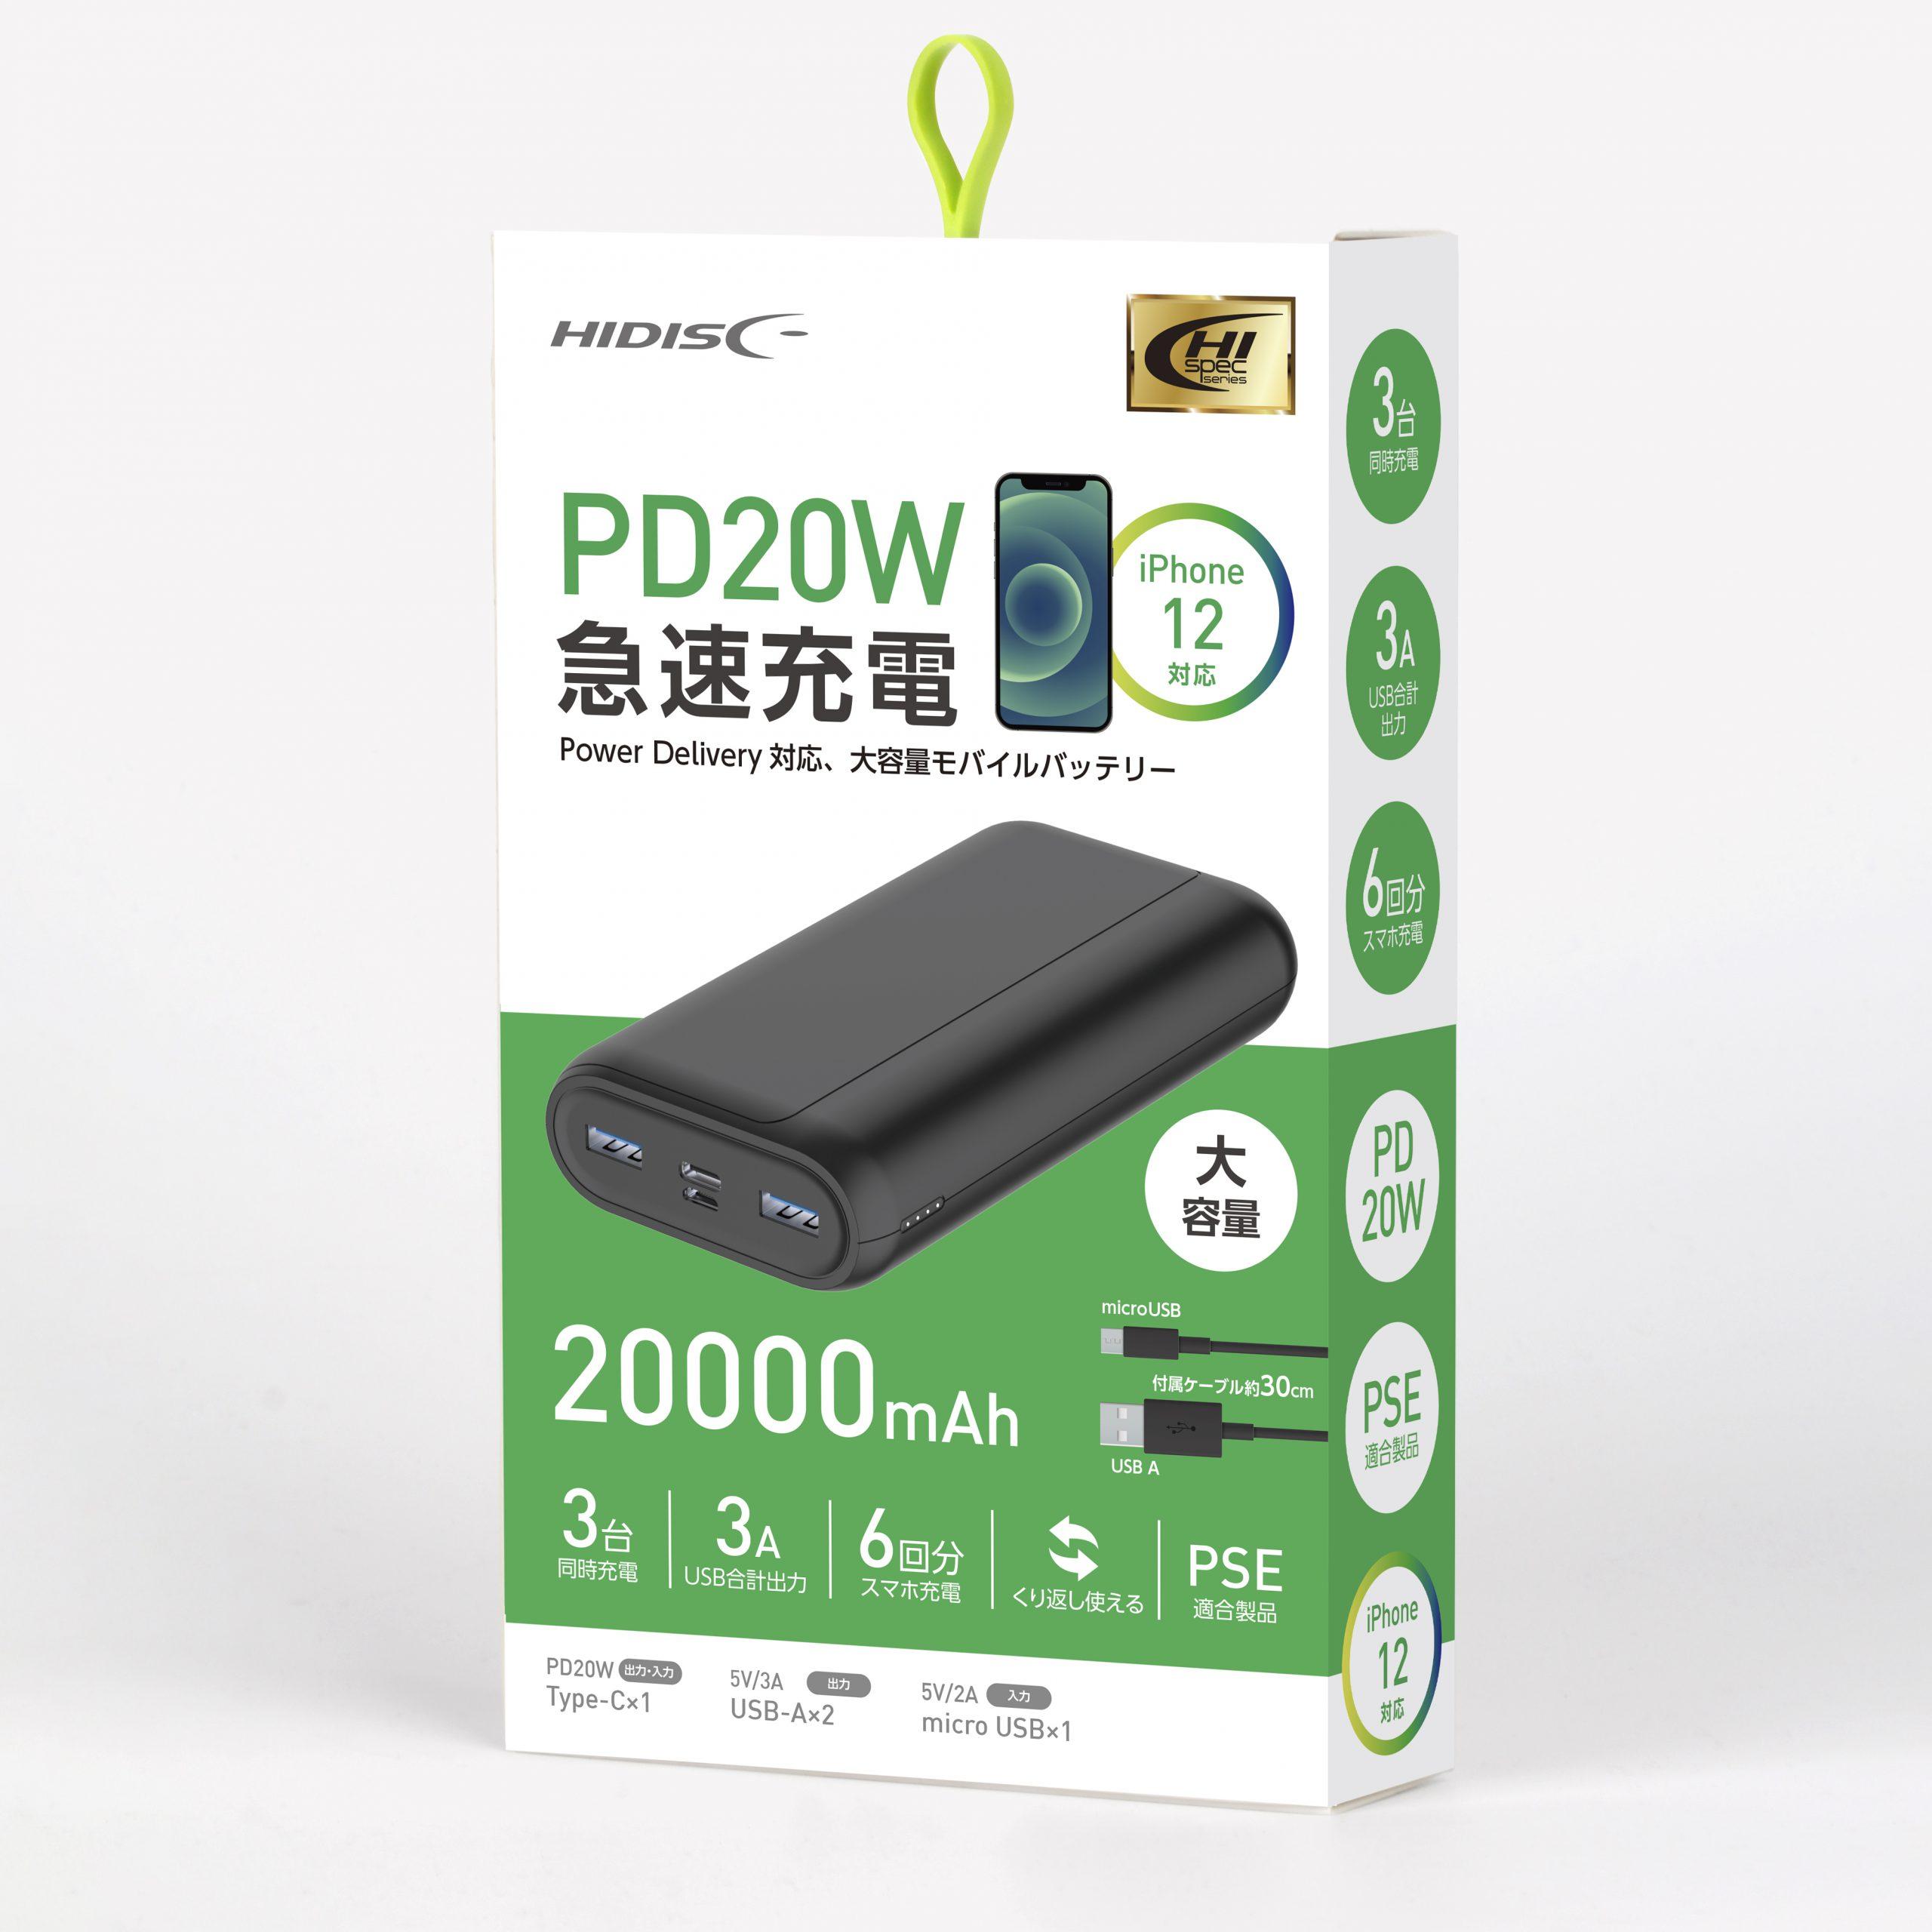 HIDISC PD20W, QC3.0対応 20000mAhモバイルバッテリー ブラック HD-PD20W20000BTBK